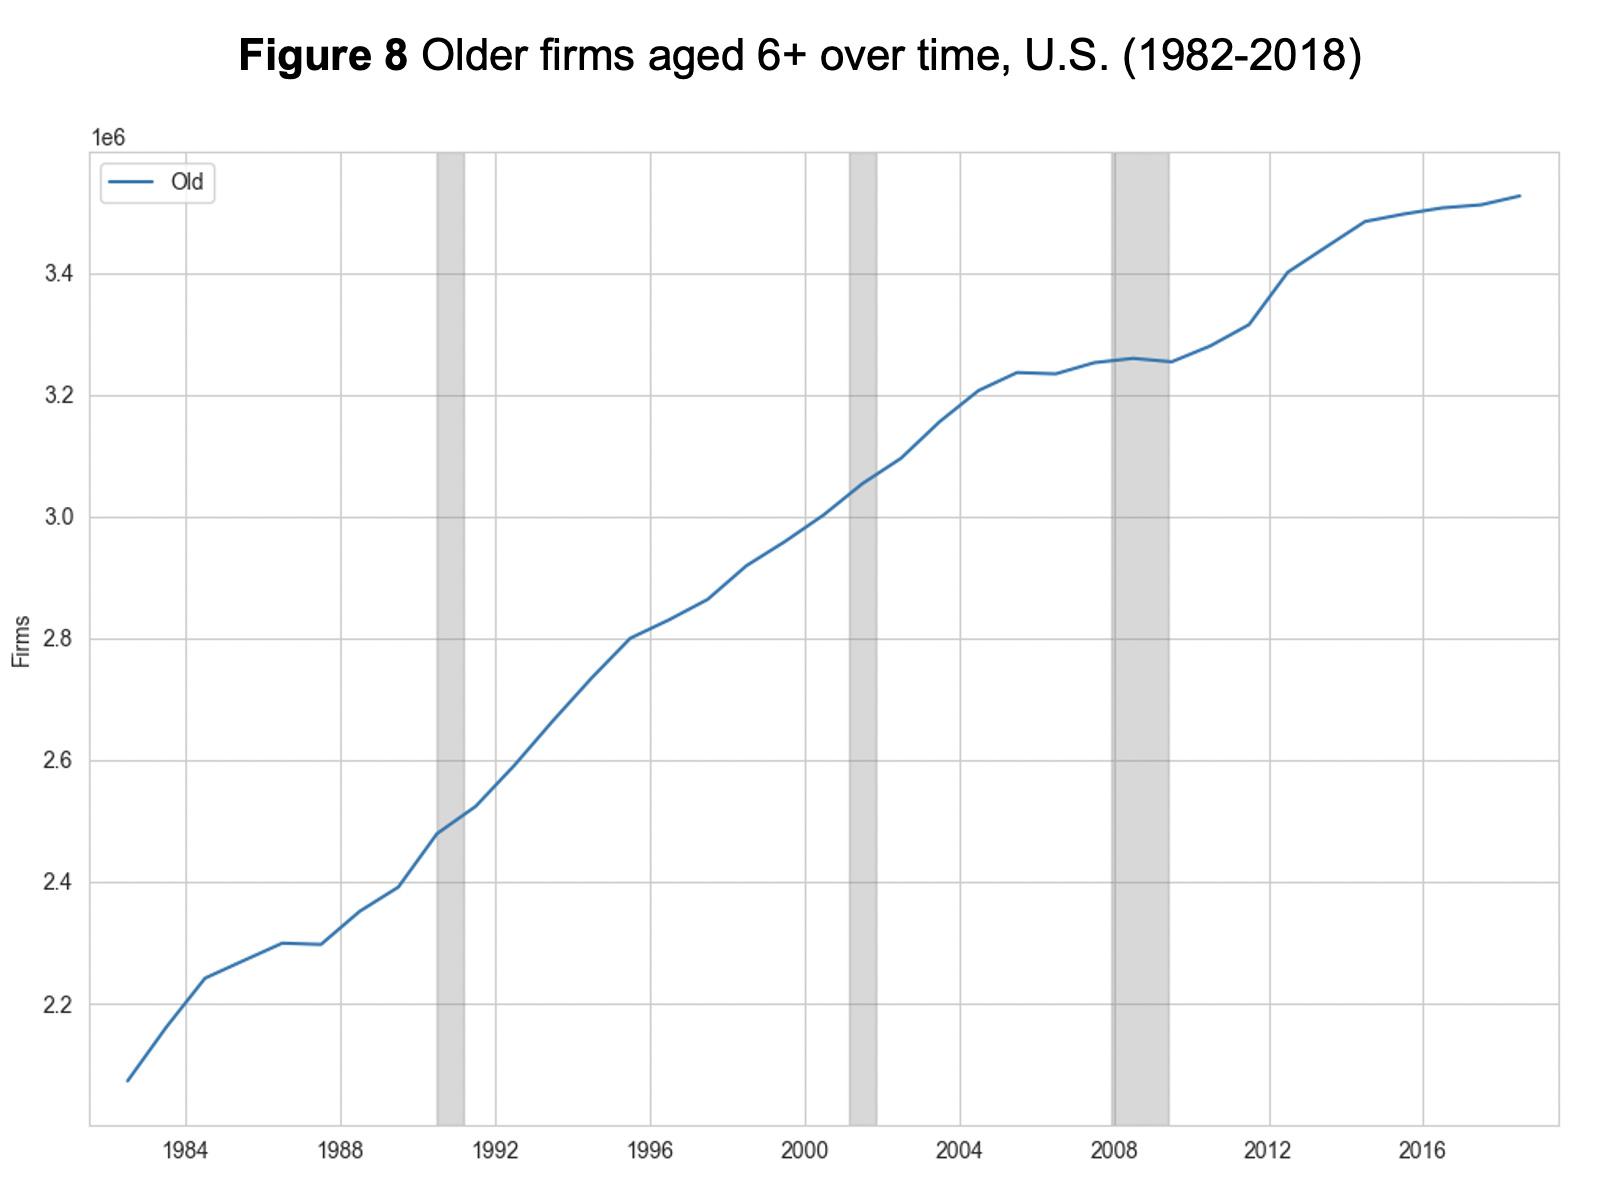 Figure 8: Older firms aged 6+ over time, U.S. (1982-2018)